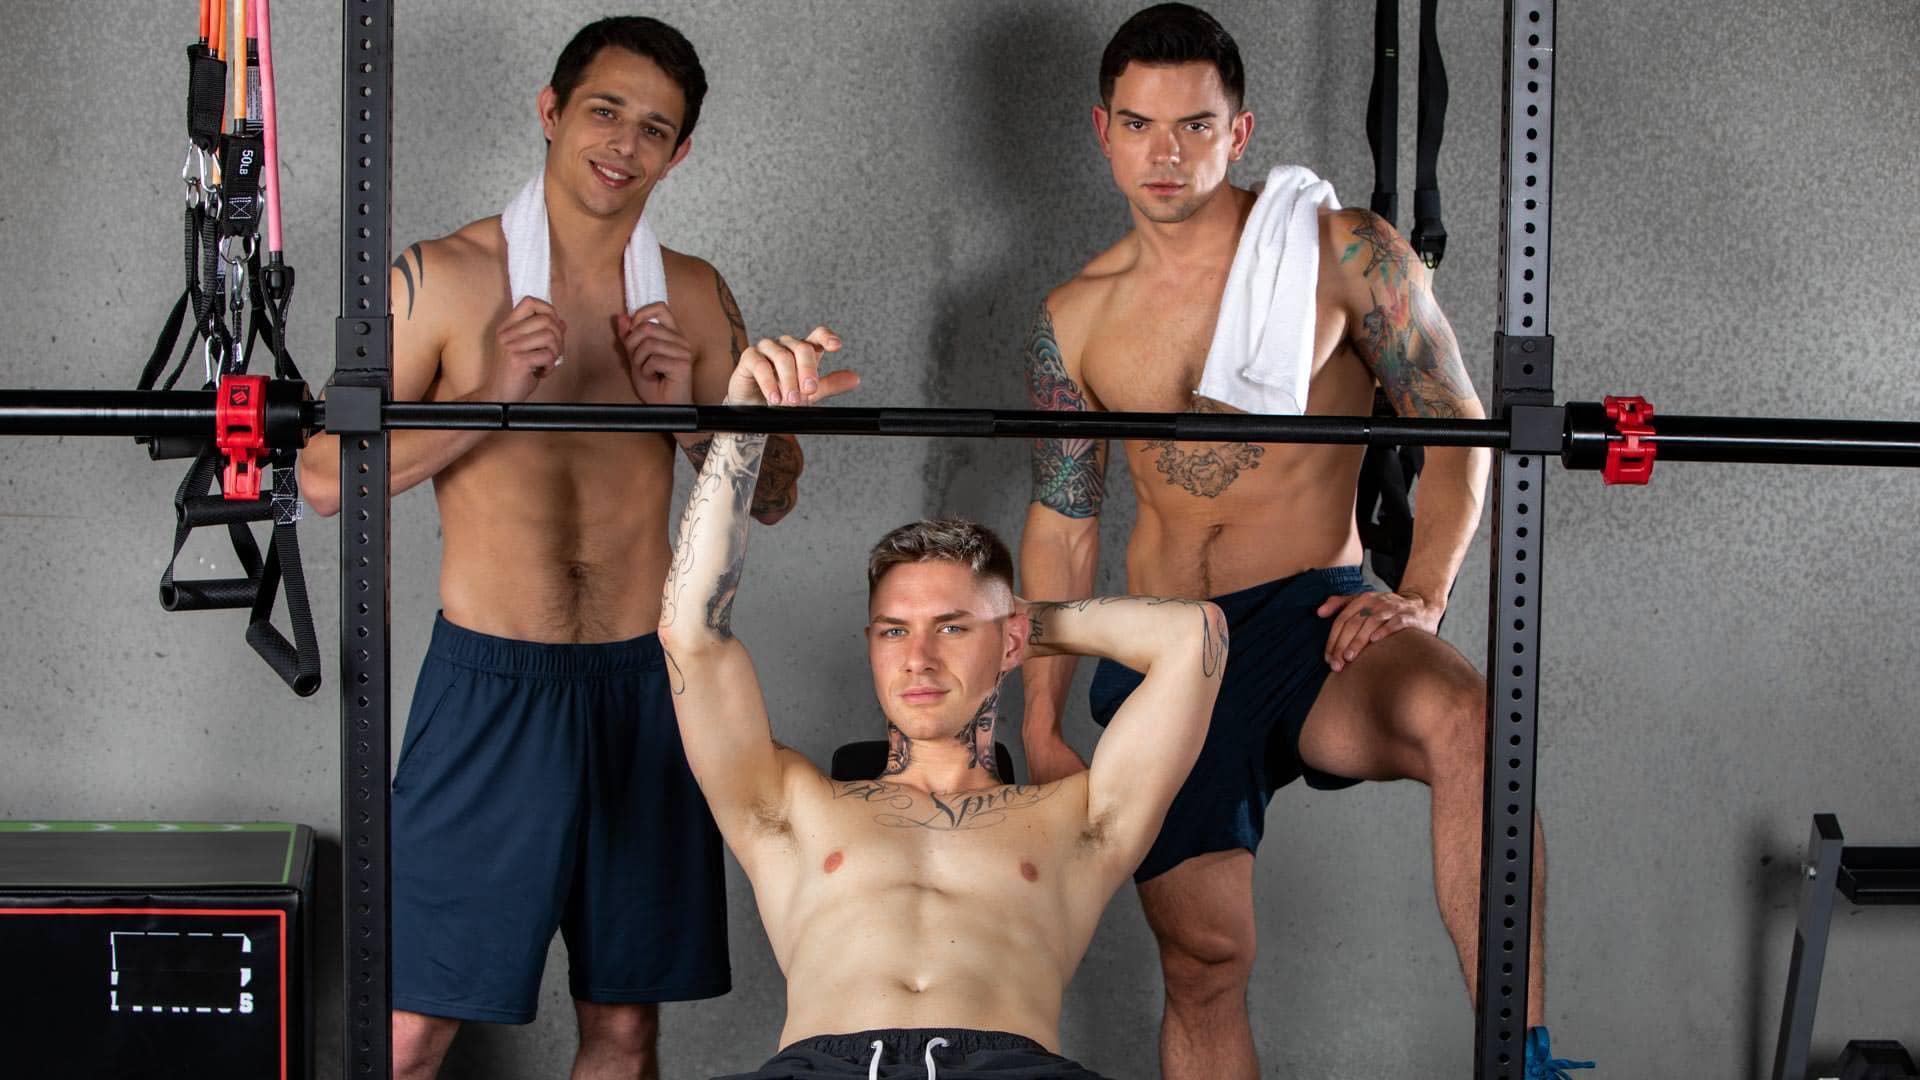 Gym Sluts – Zak Bishop, Dakota Payne and Kyle Wyncrest